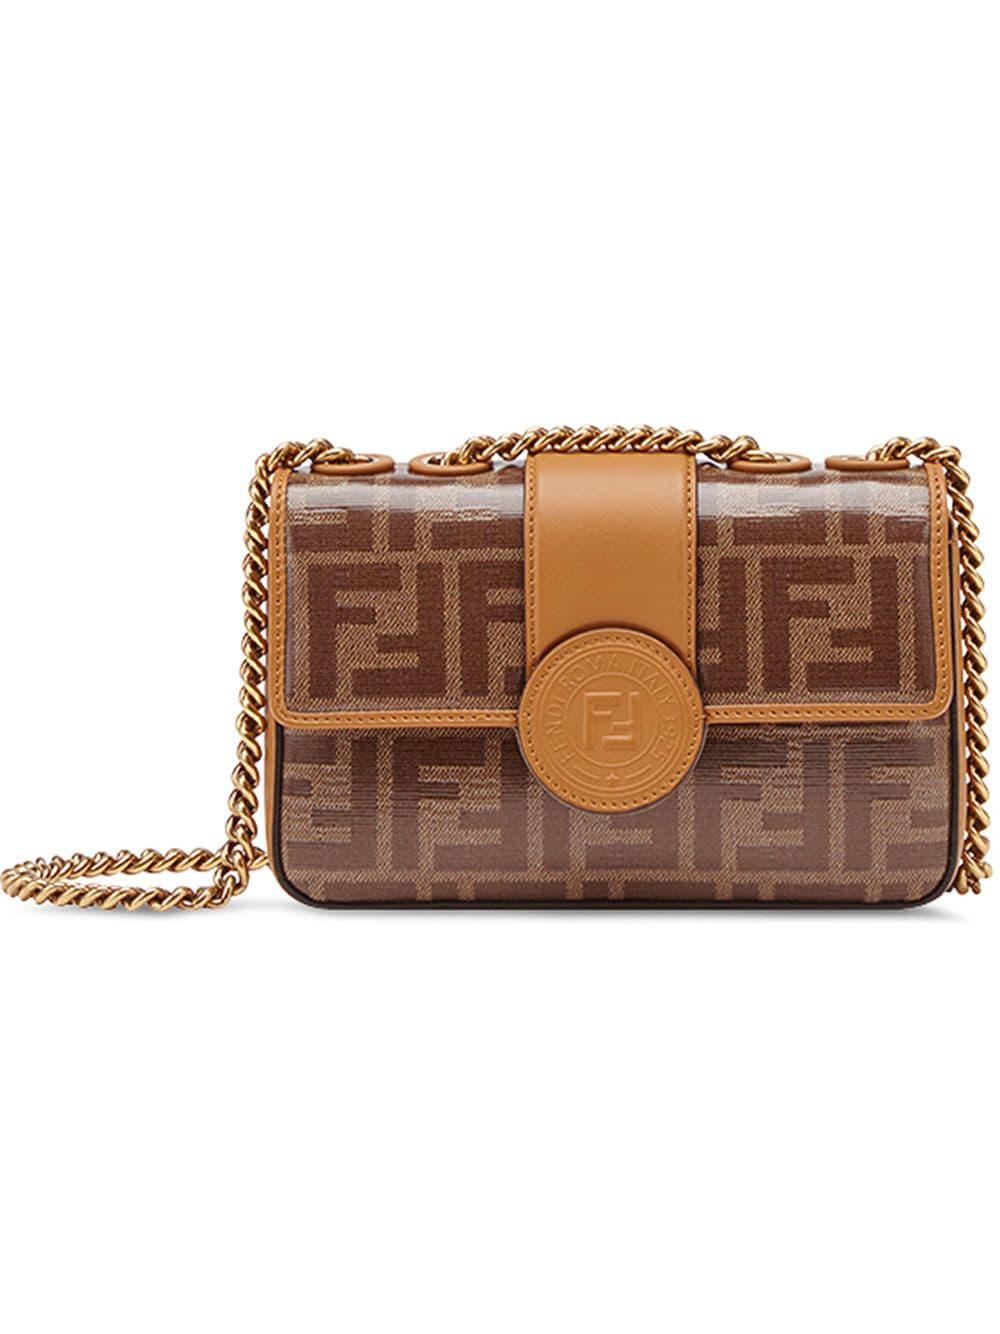 FENDI. Fendi Brown Ff Logo Leather Camera Bag 2d853f0bd0ce4